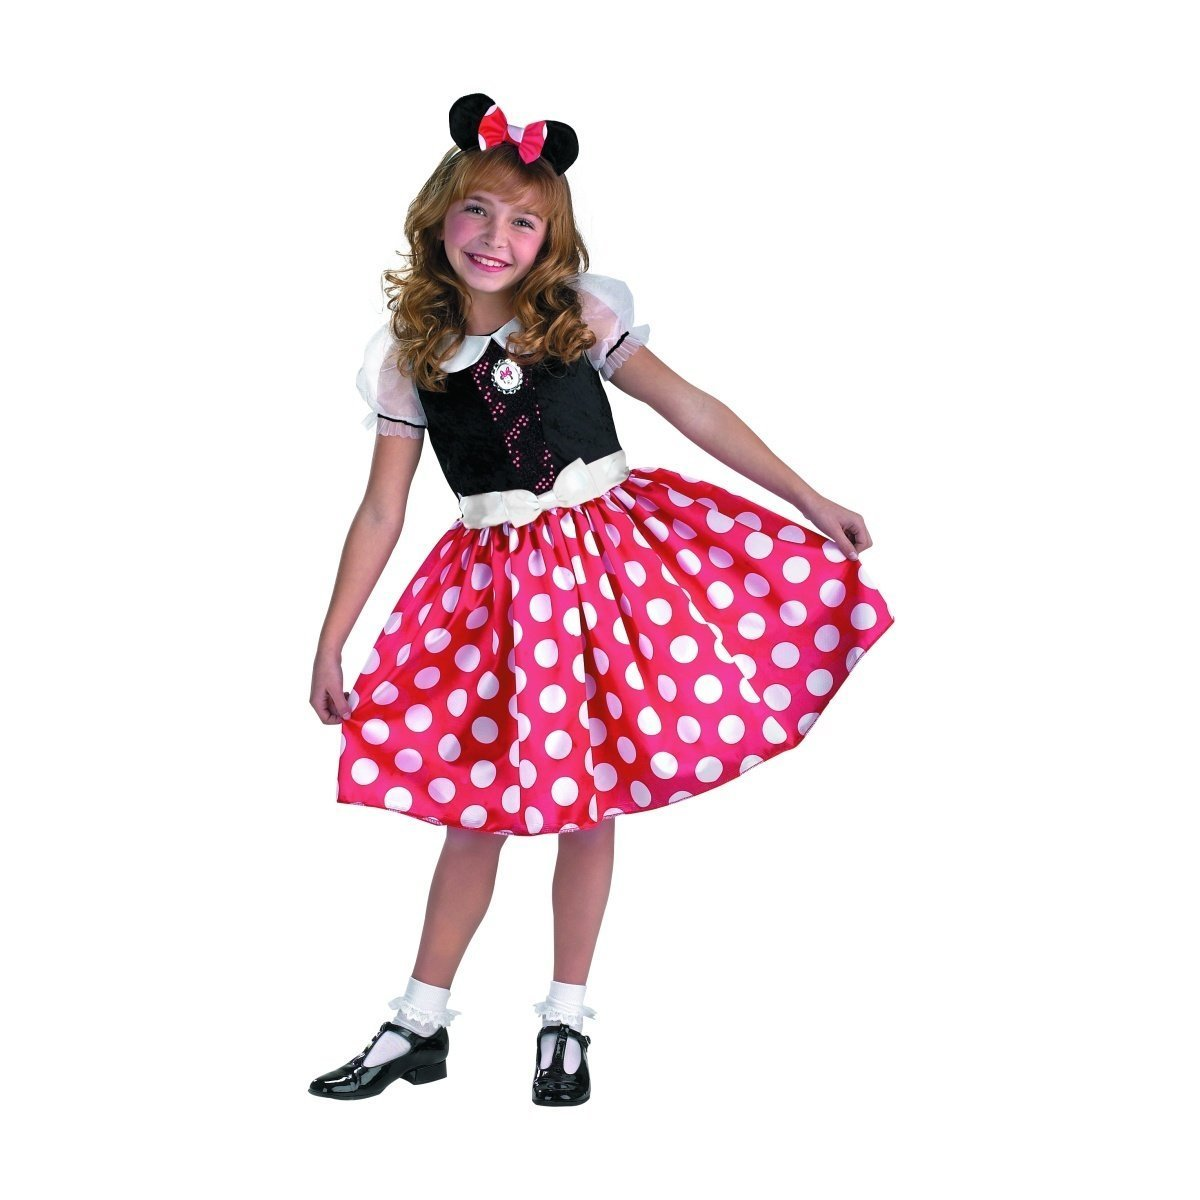 sc 1 st  Amazon.com & Amazon.com: Minnie Mouse Classic Child Costume - X-Small: Clothing